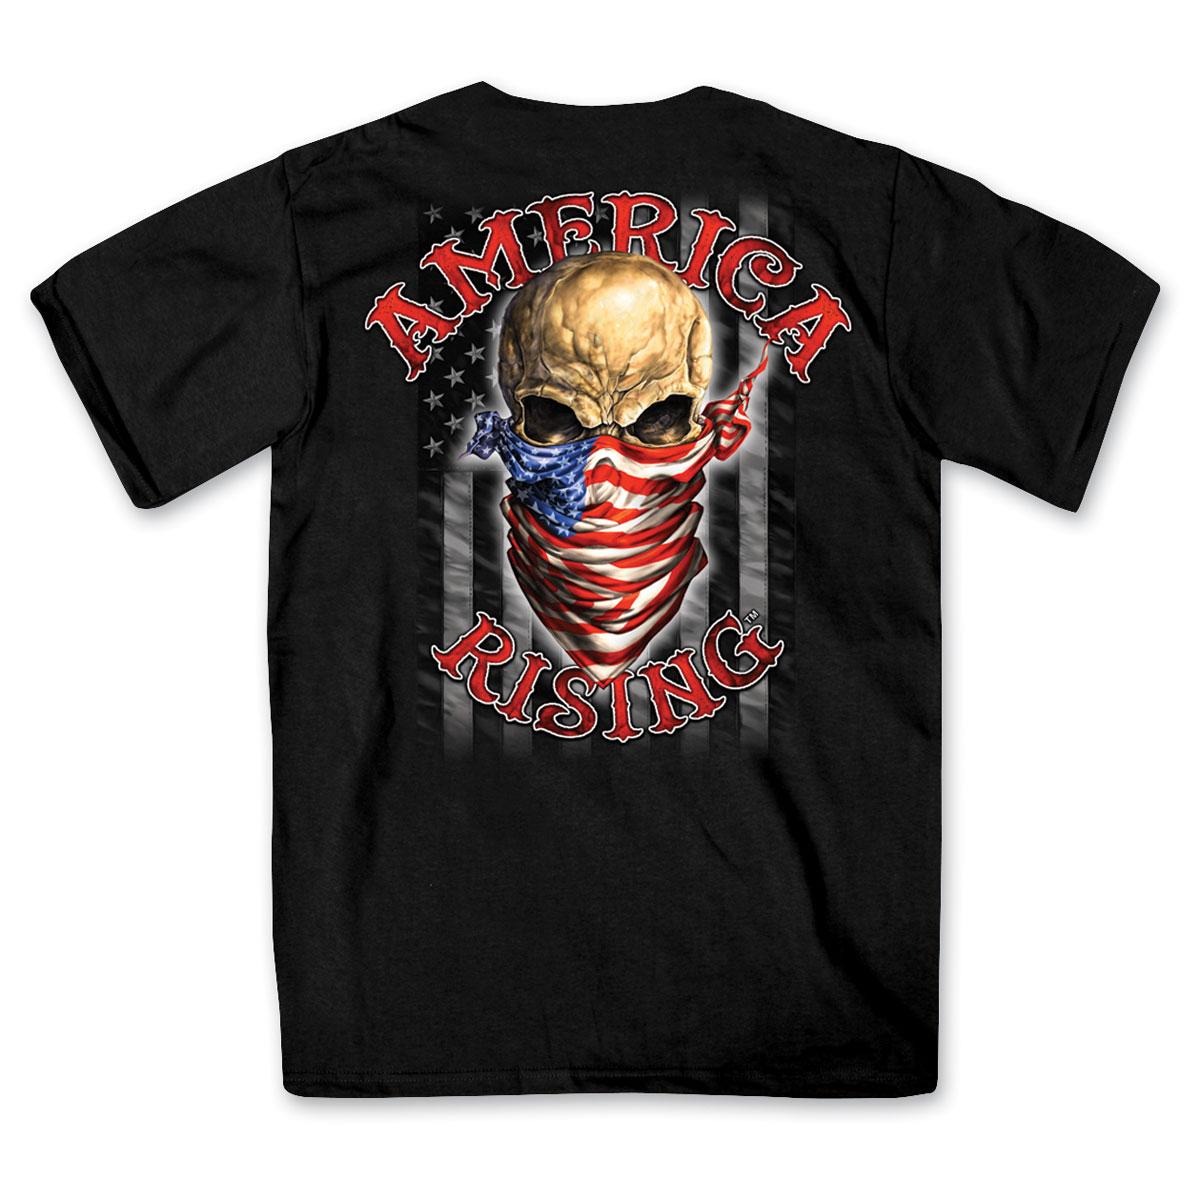 Hot Leathers Men's America Rising Black T-Shirt